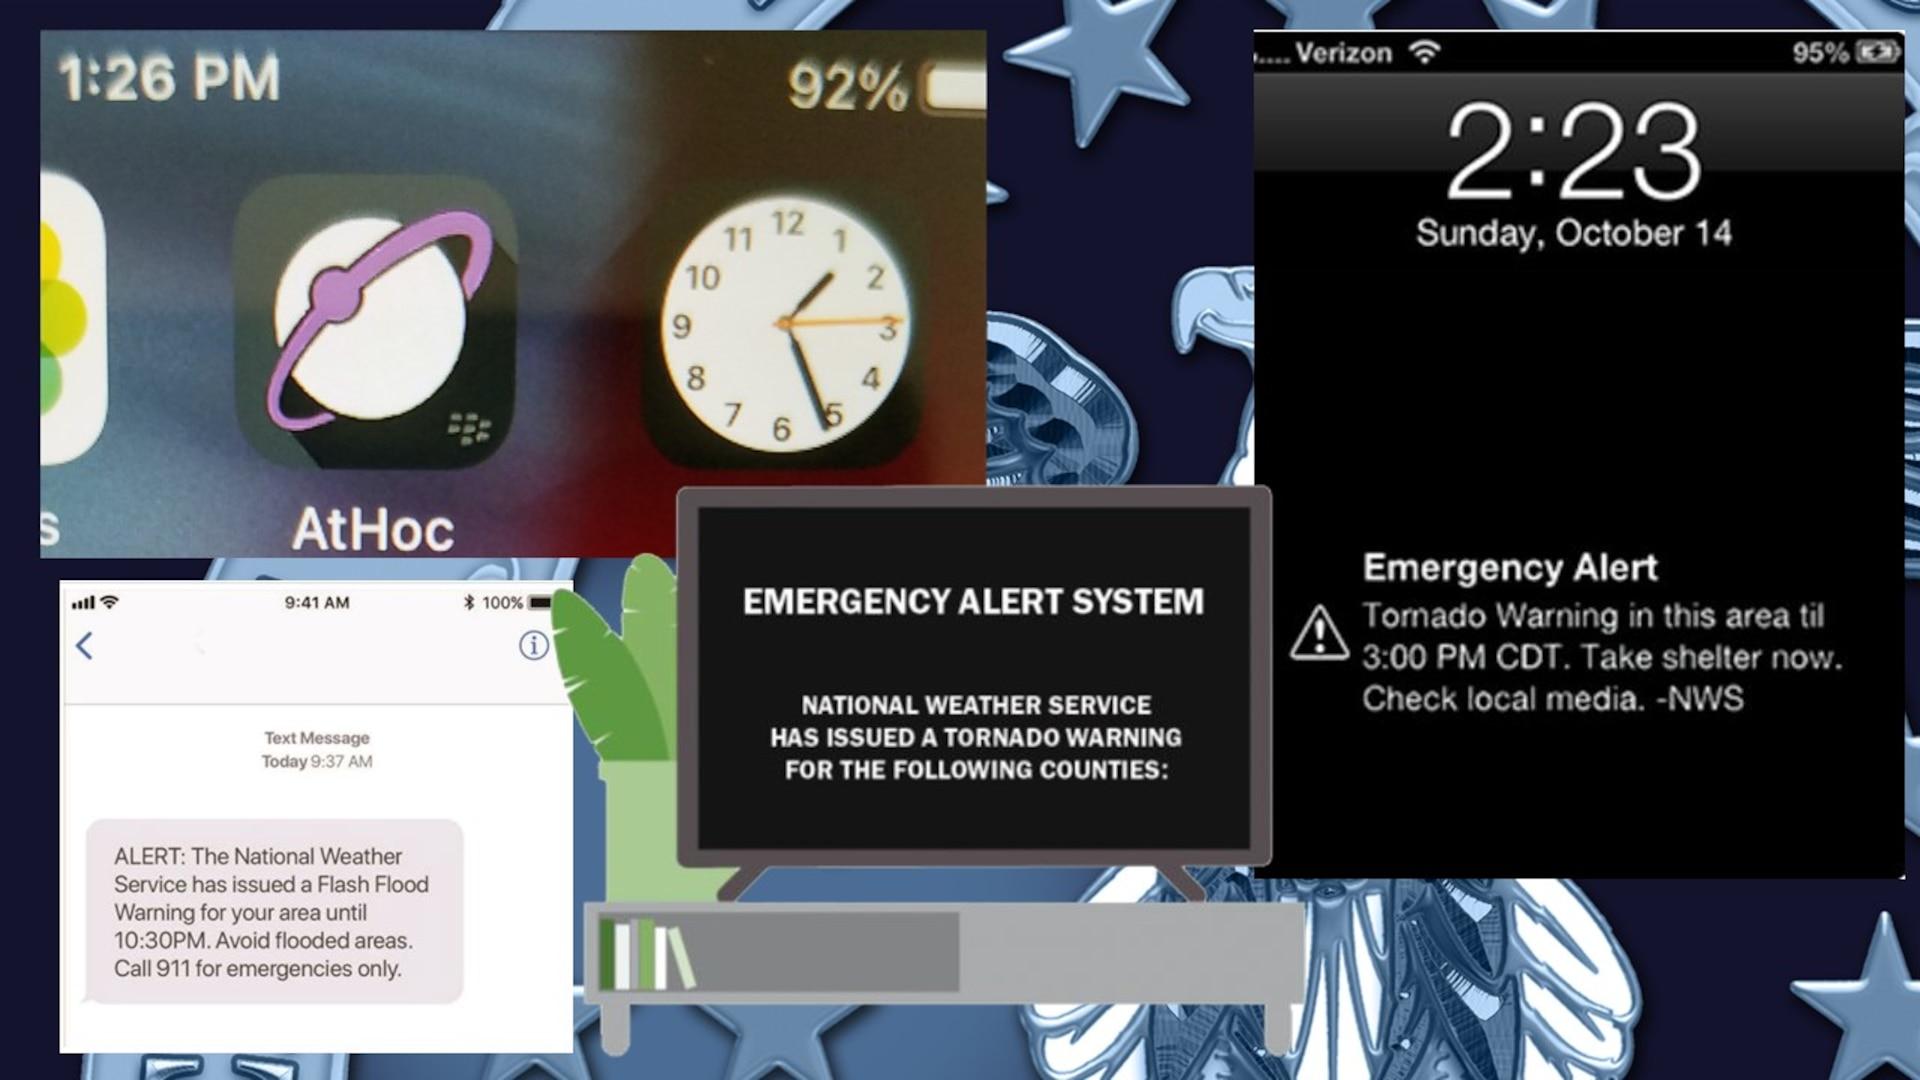 DLA Installation Management Susquehanna, Pennsylvania, Security & Emergency Services National Preparedness Month week #5 tip – emergency notification alert systems